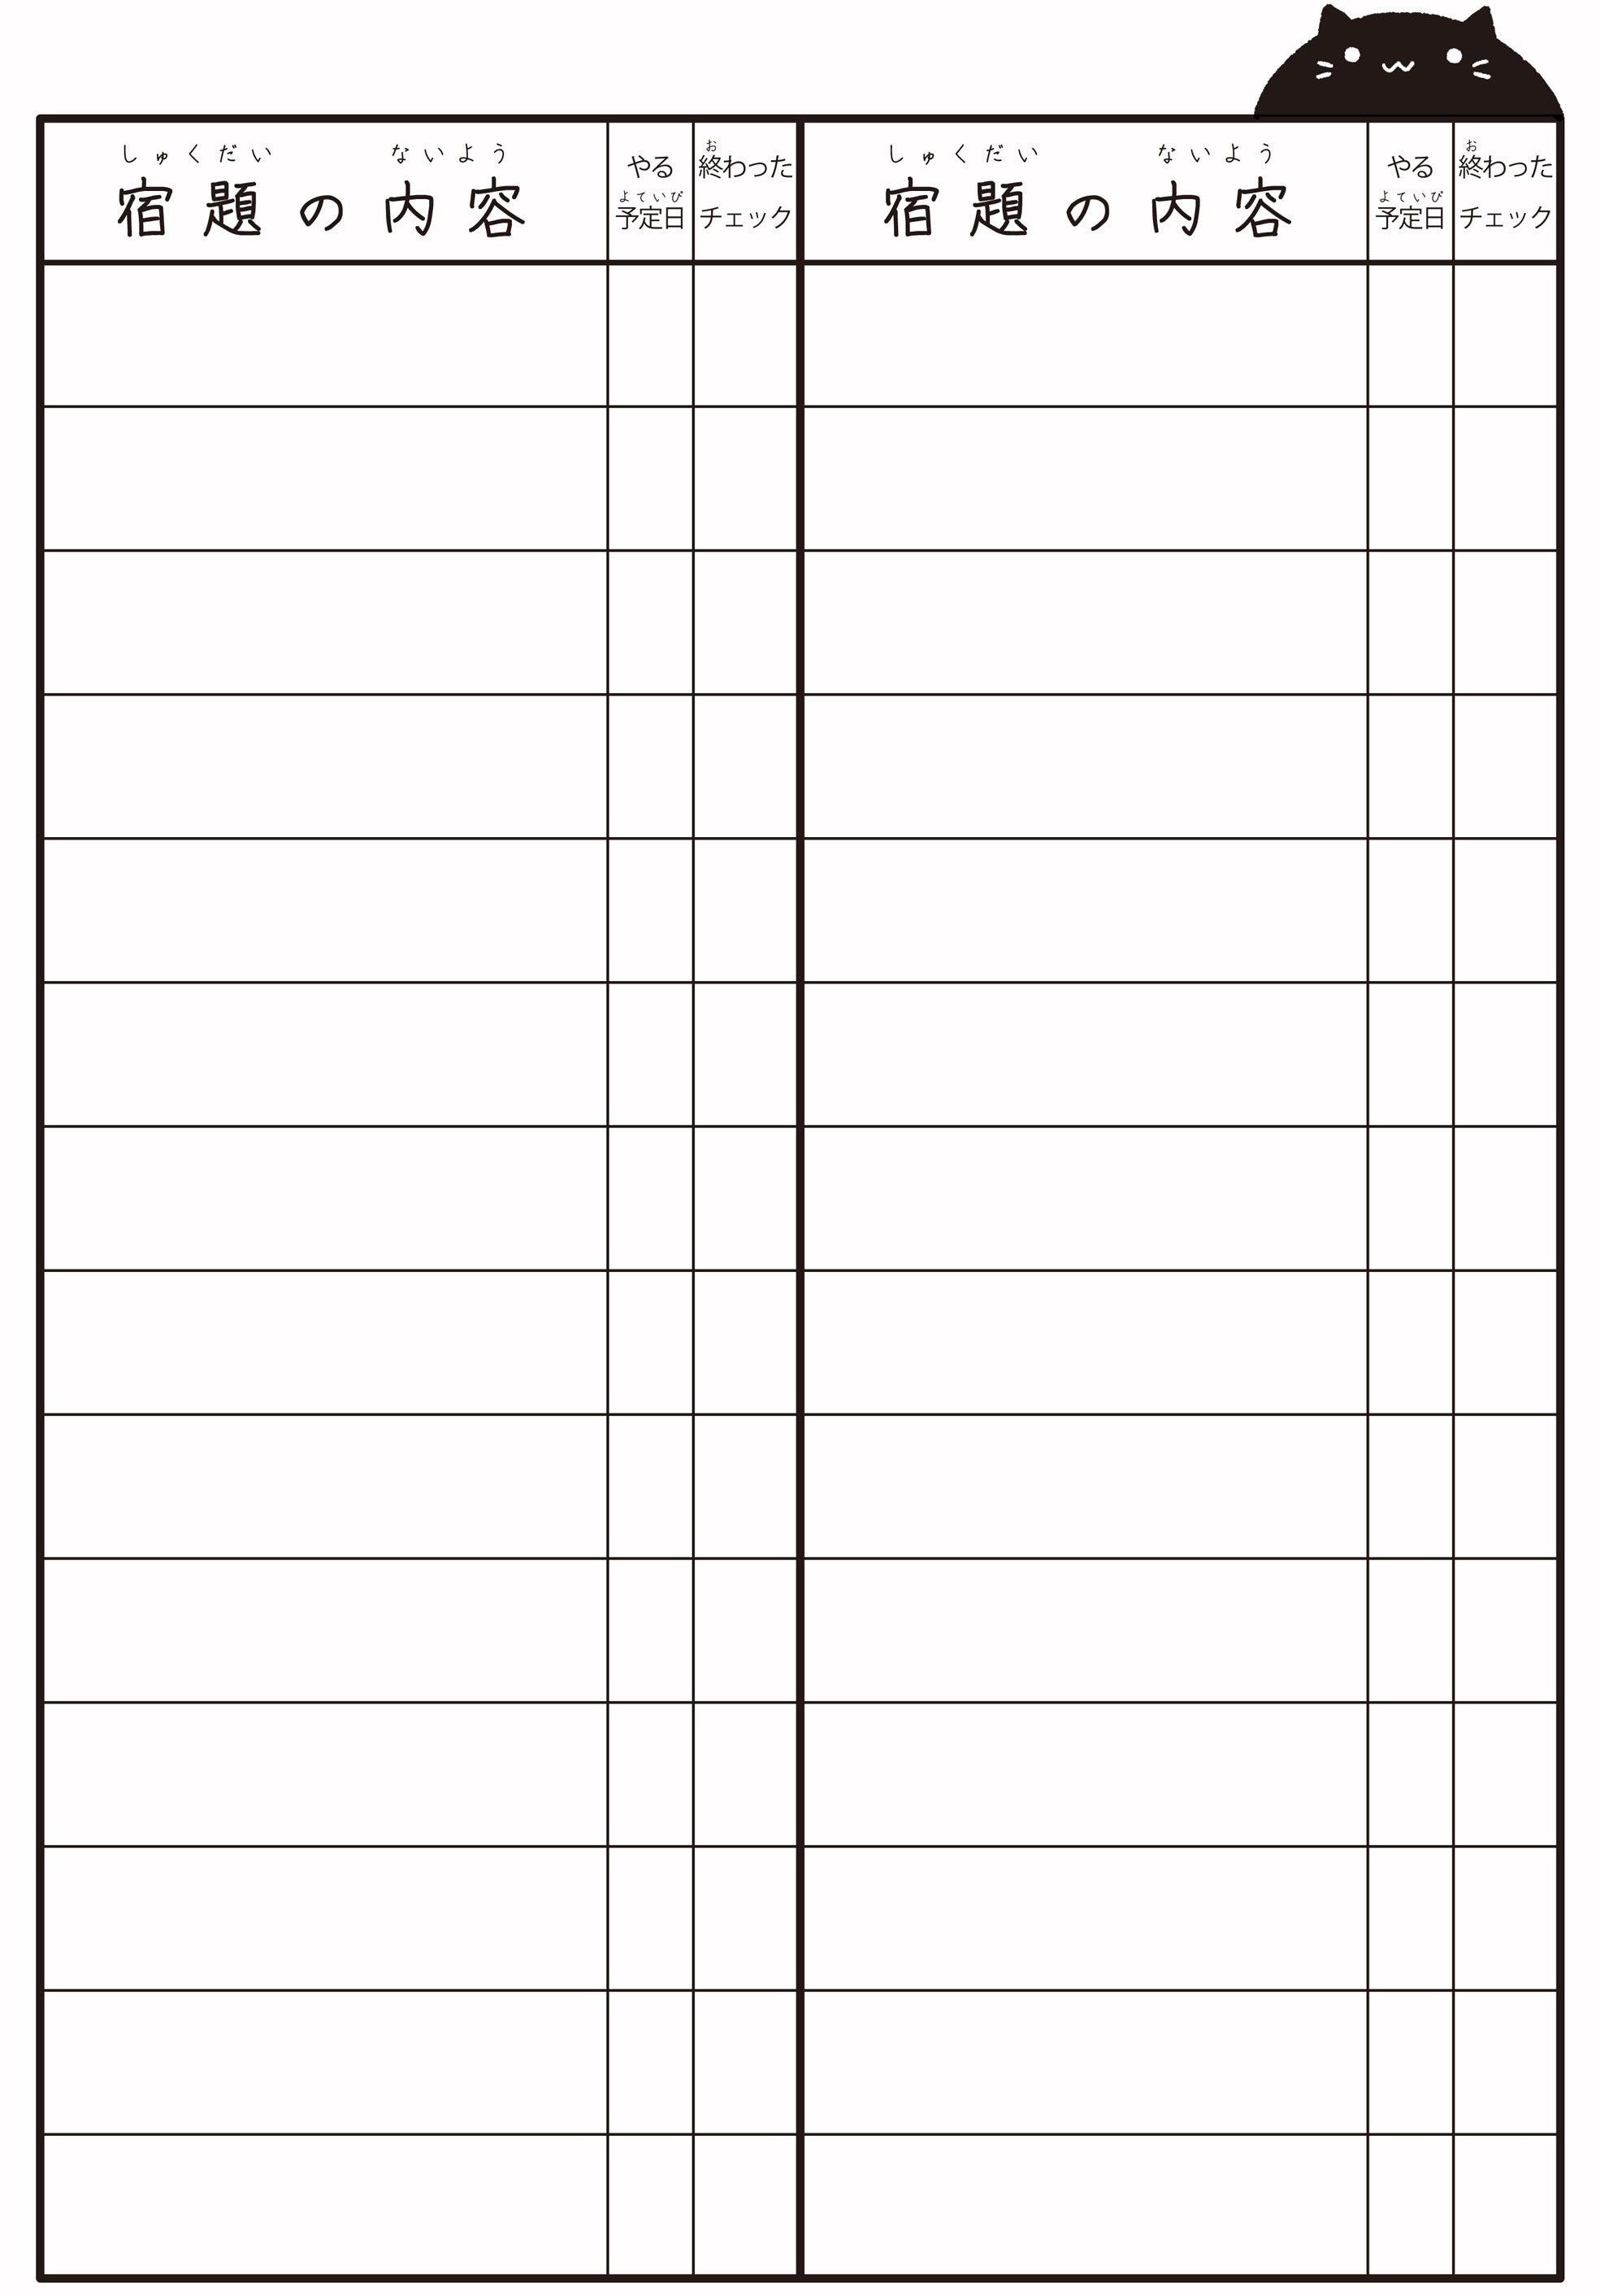 【DL配布】やることチェック表(宿題・持ち物など)